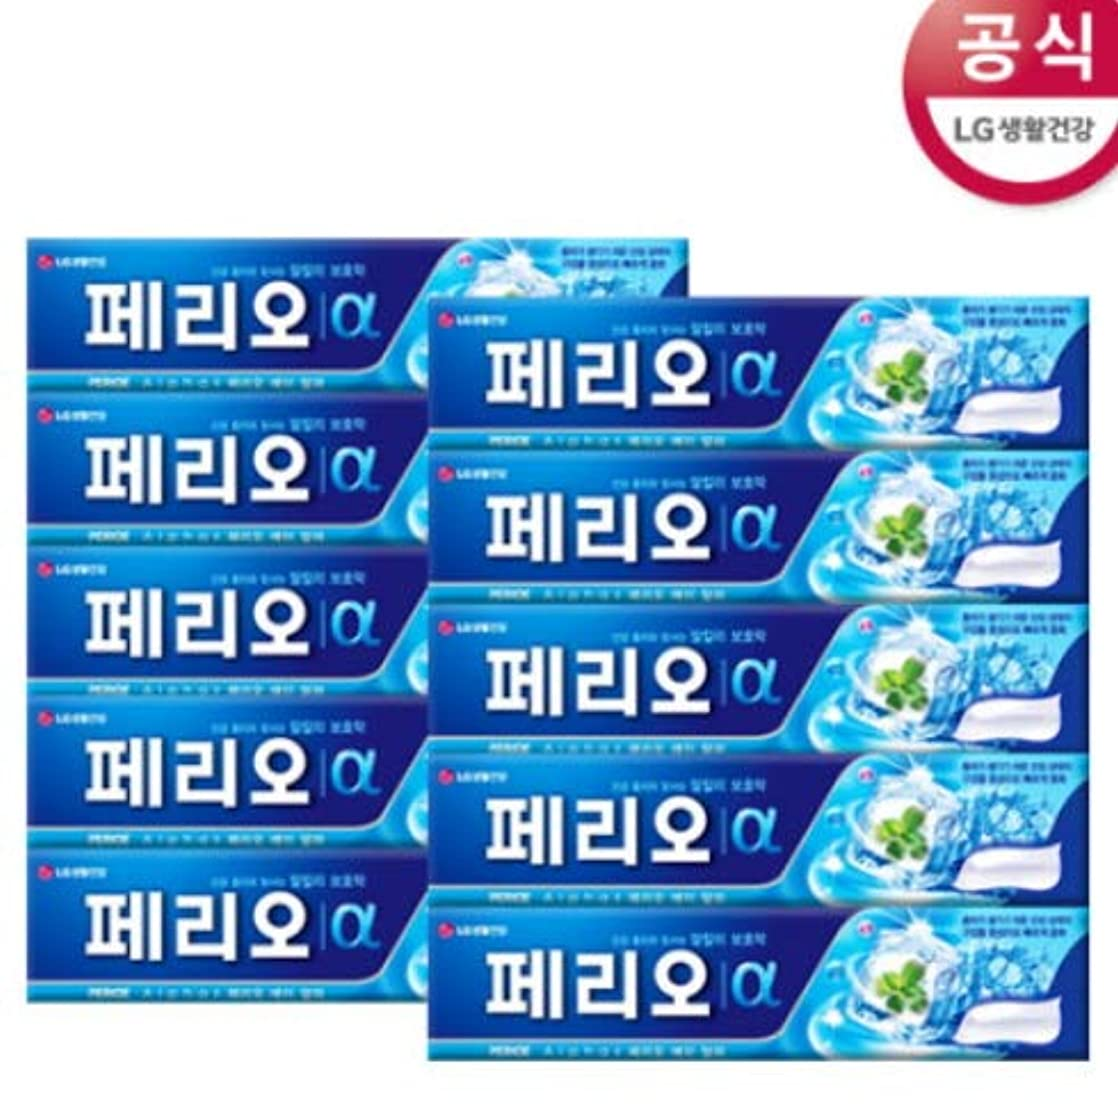 [LG HnB] Perio Alpha Toothpaste/ペリオアルファ歯磨き粉 170gx10個(海外直送品)